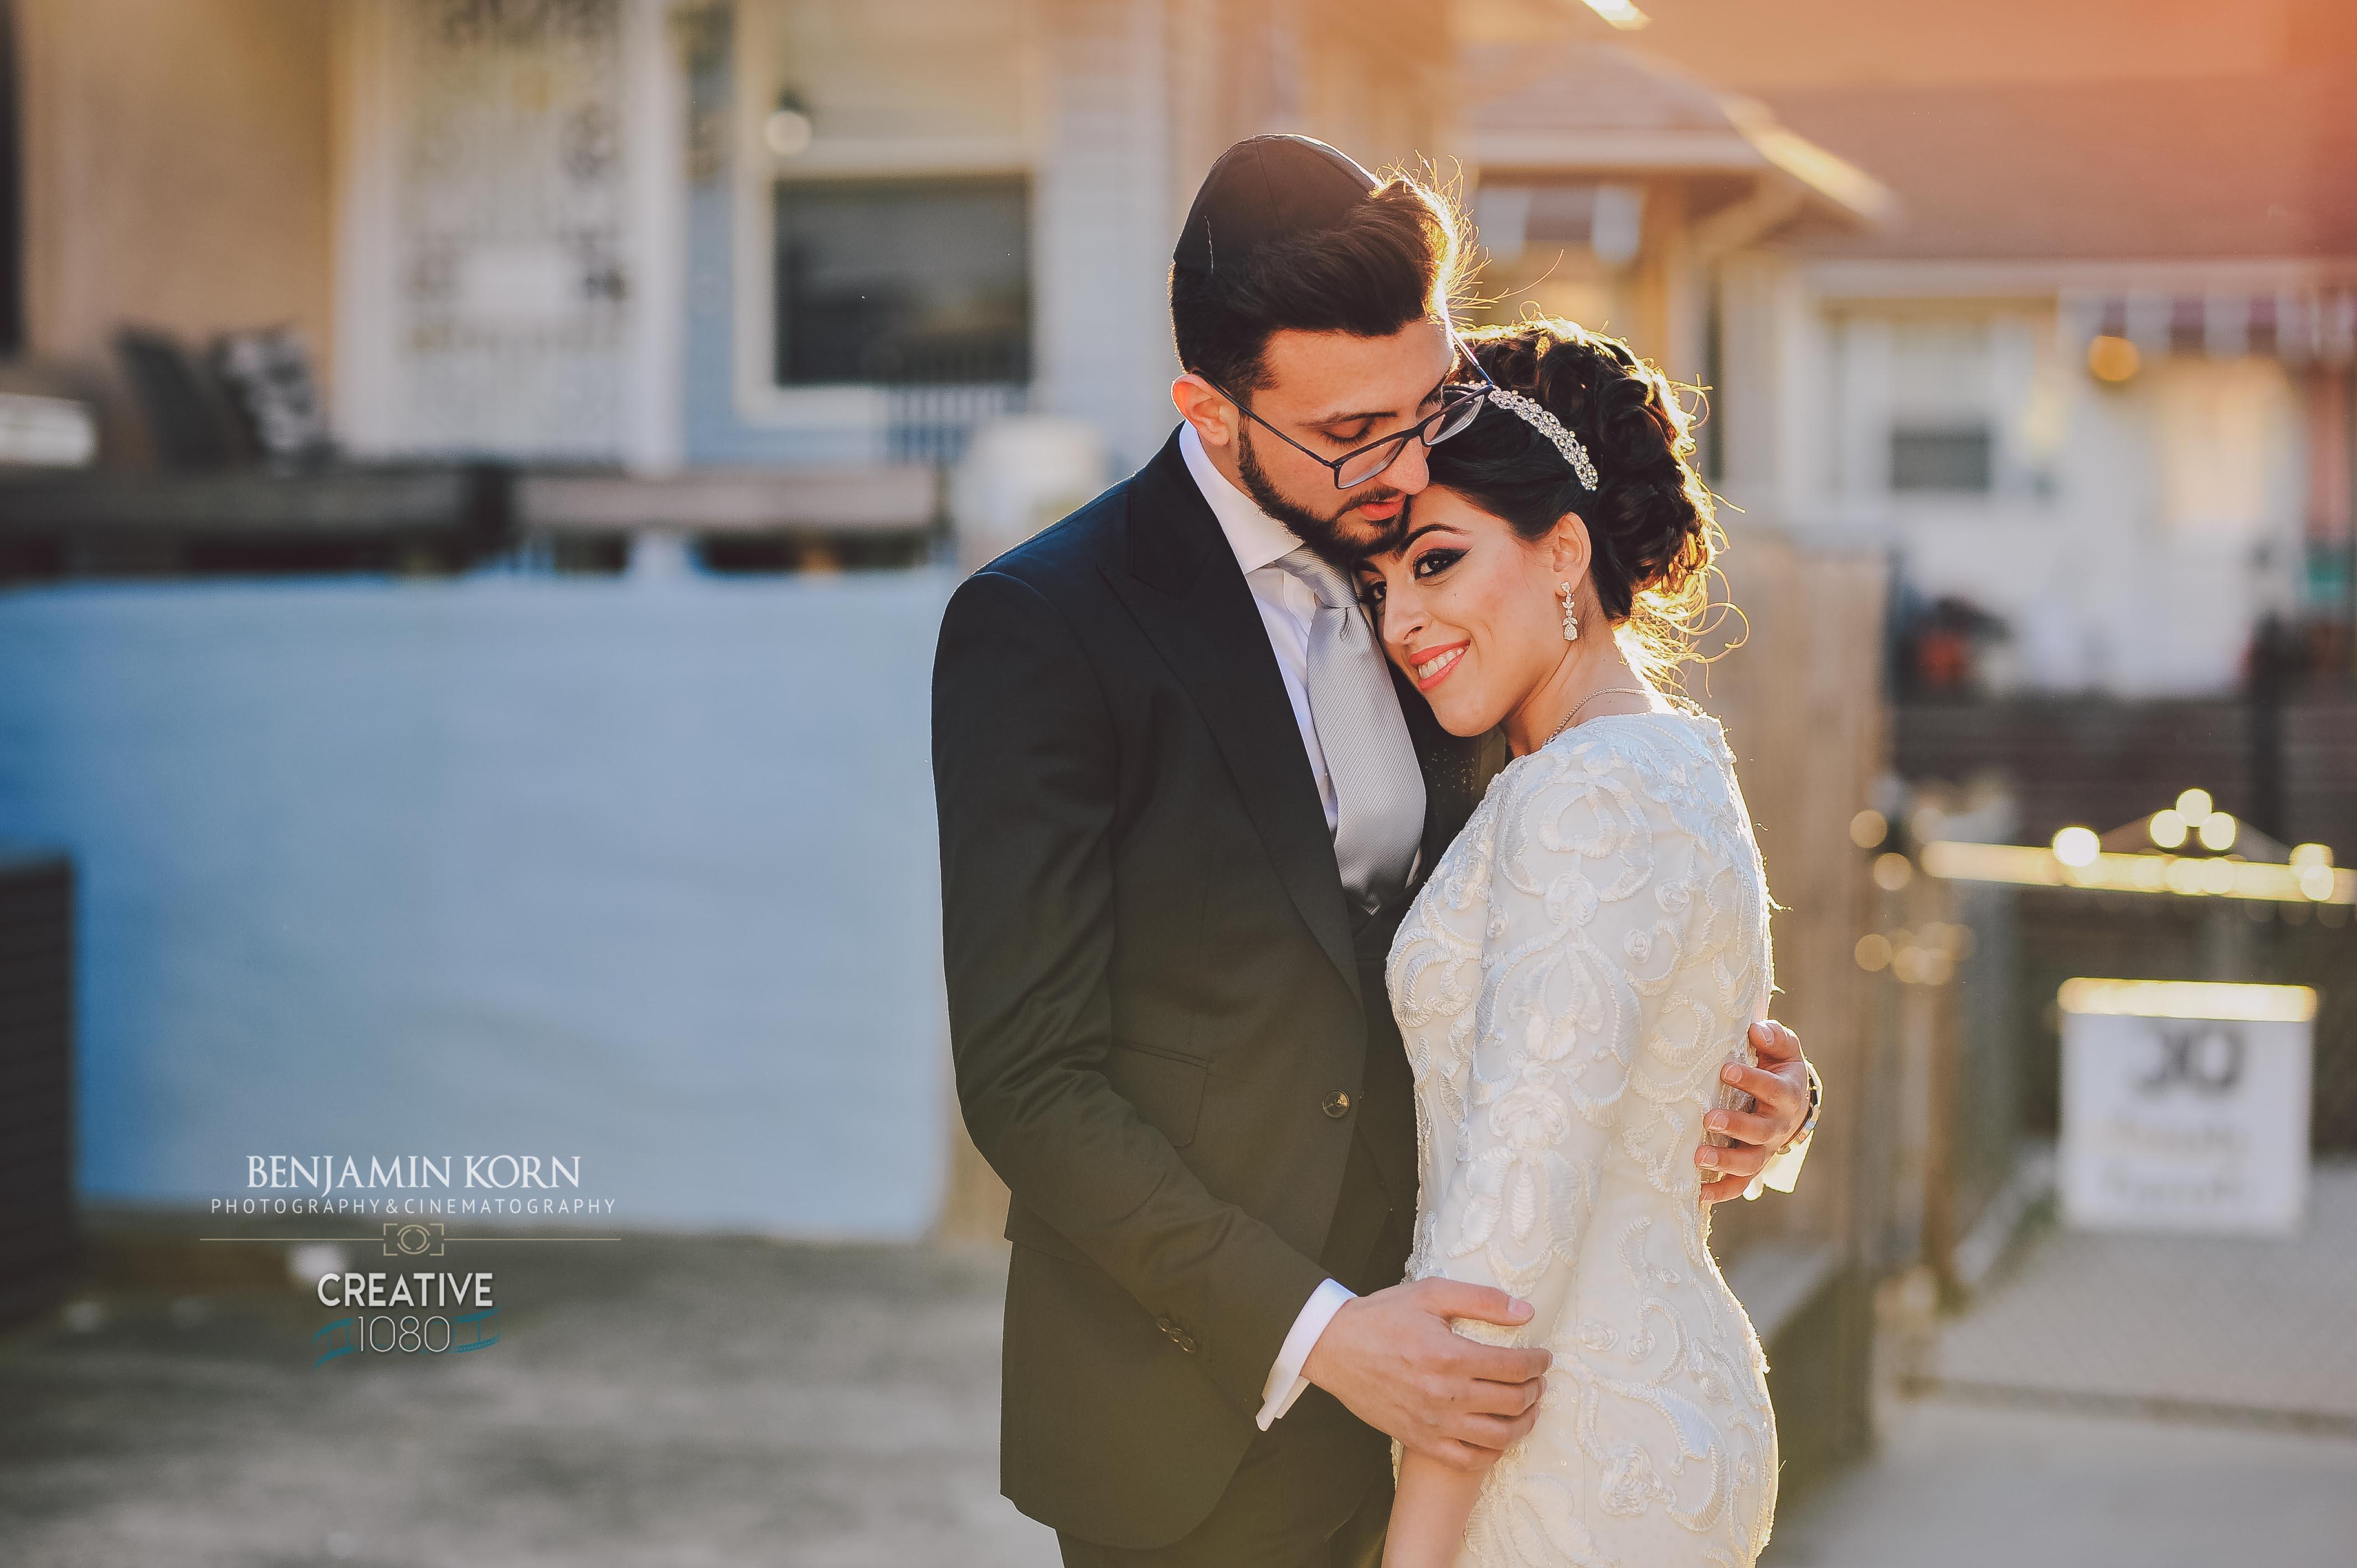 Benjamin Korn Photography - S&M Wed-32